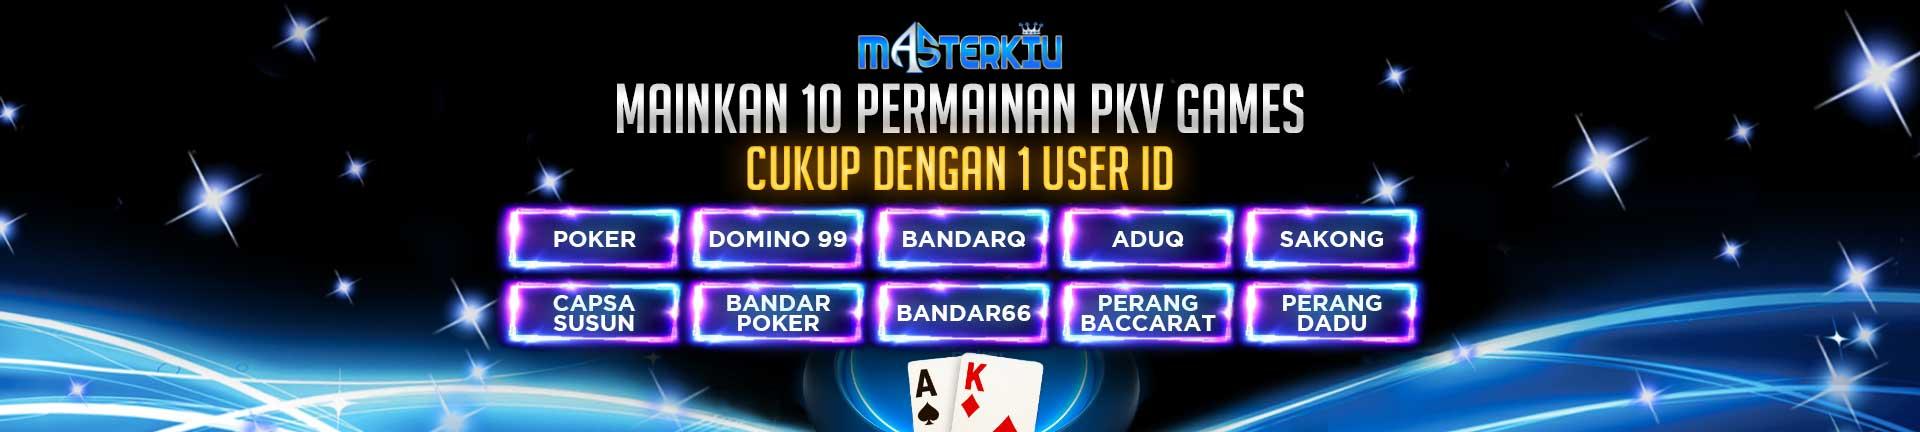 tersedia 10 permainan pkv games di masterkiu